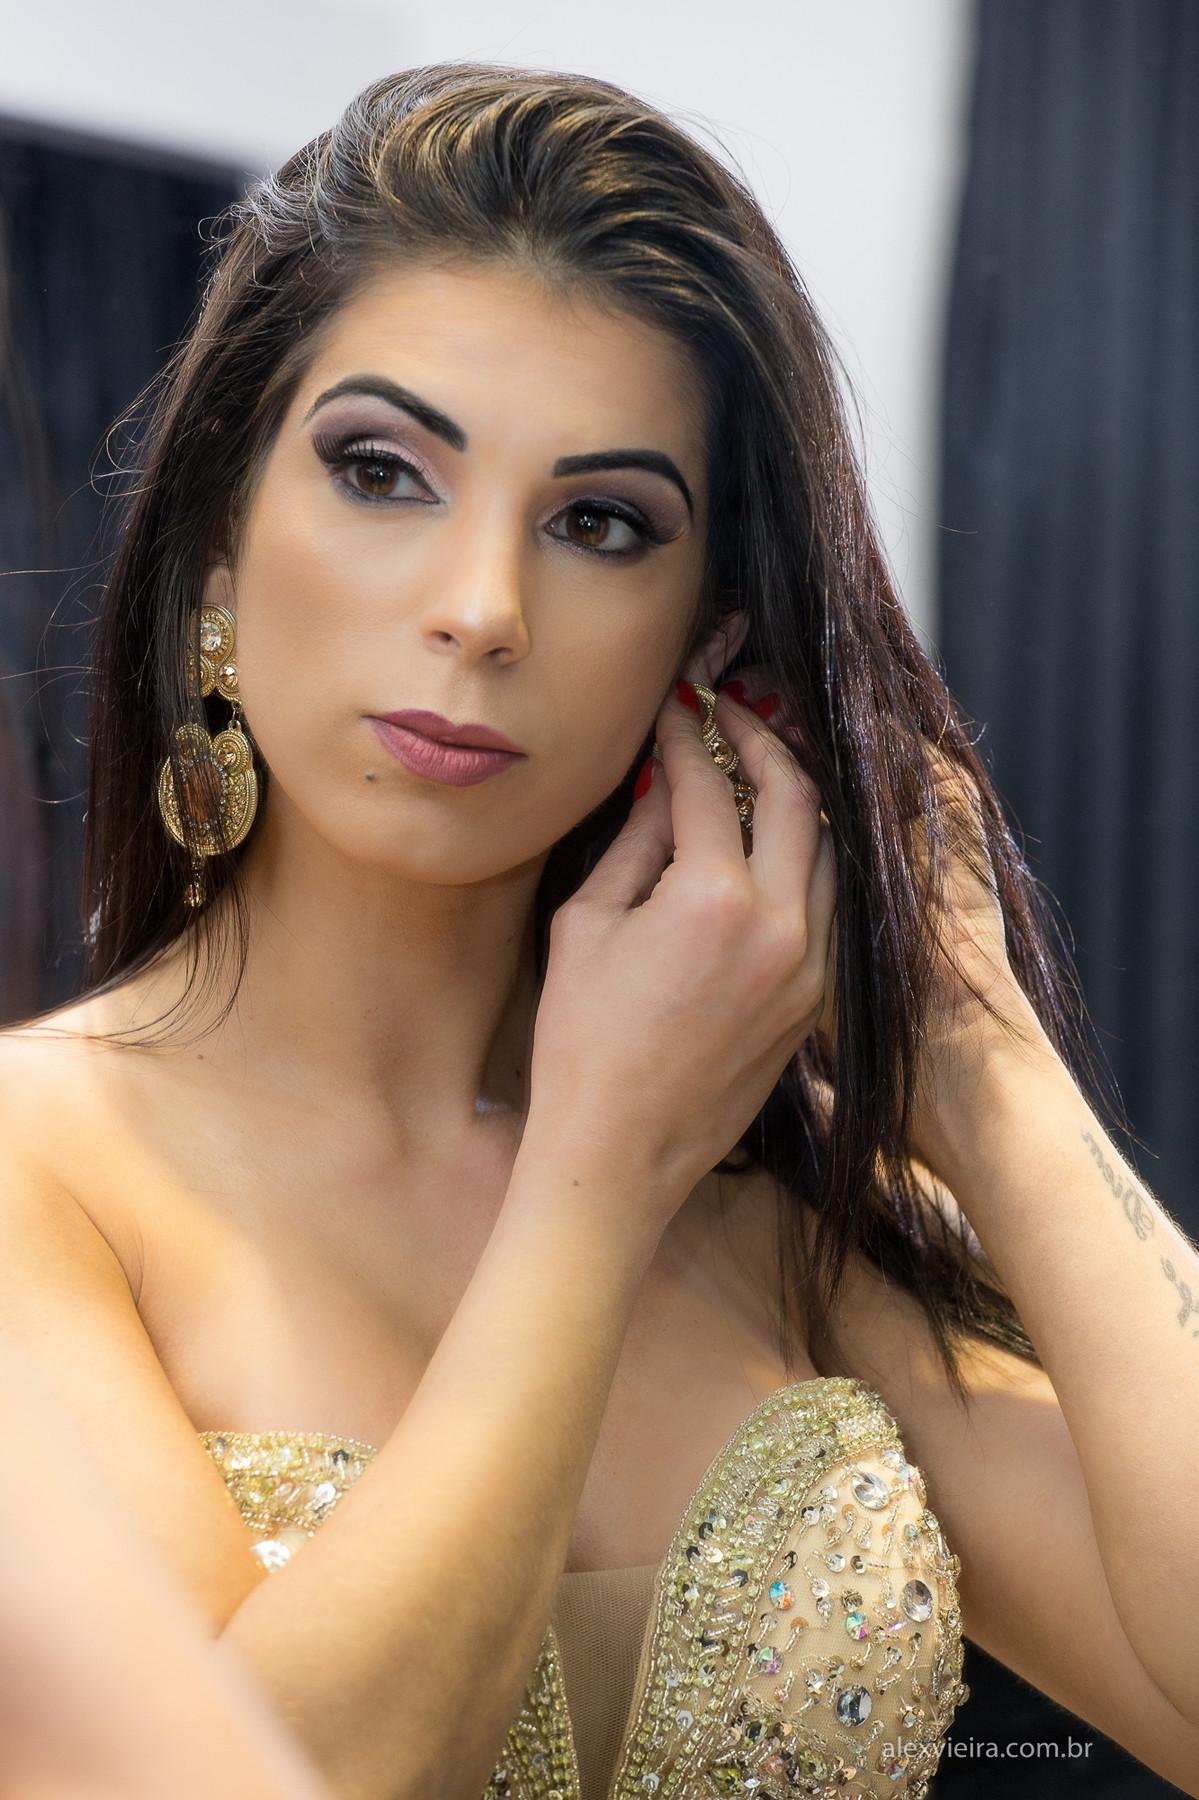 Suellen Fernandes SBT by @alexvieirafotografia